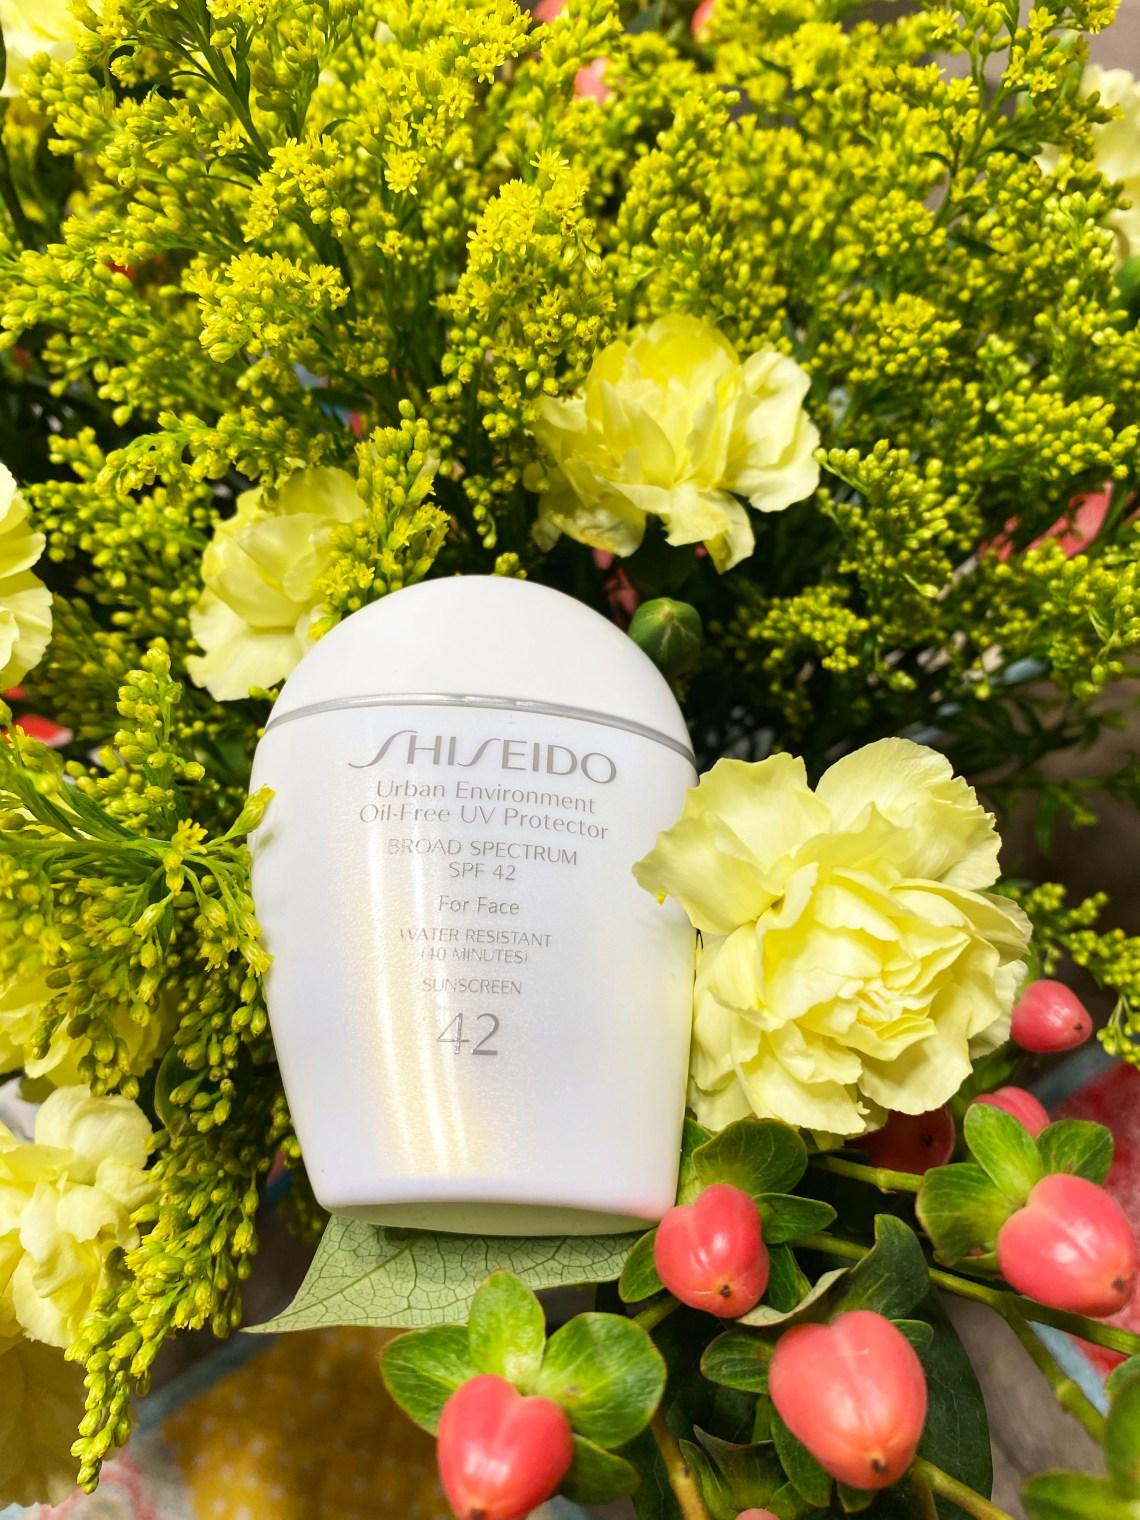 Shiseido-Urban-Envrionment